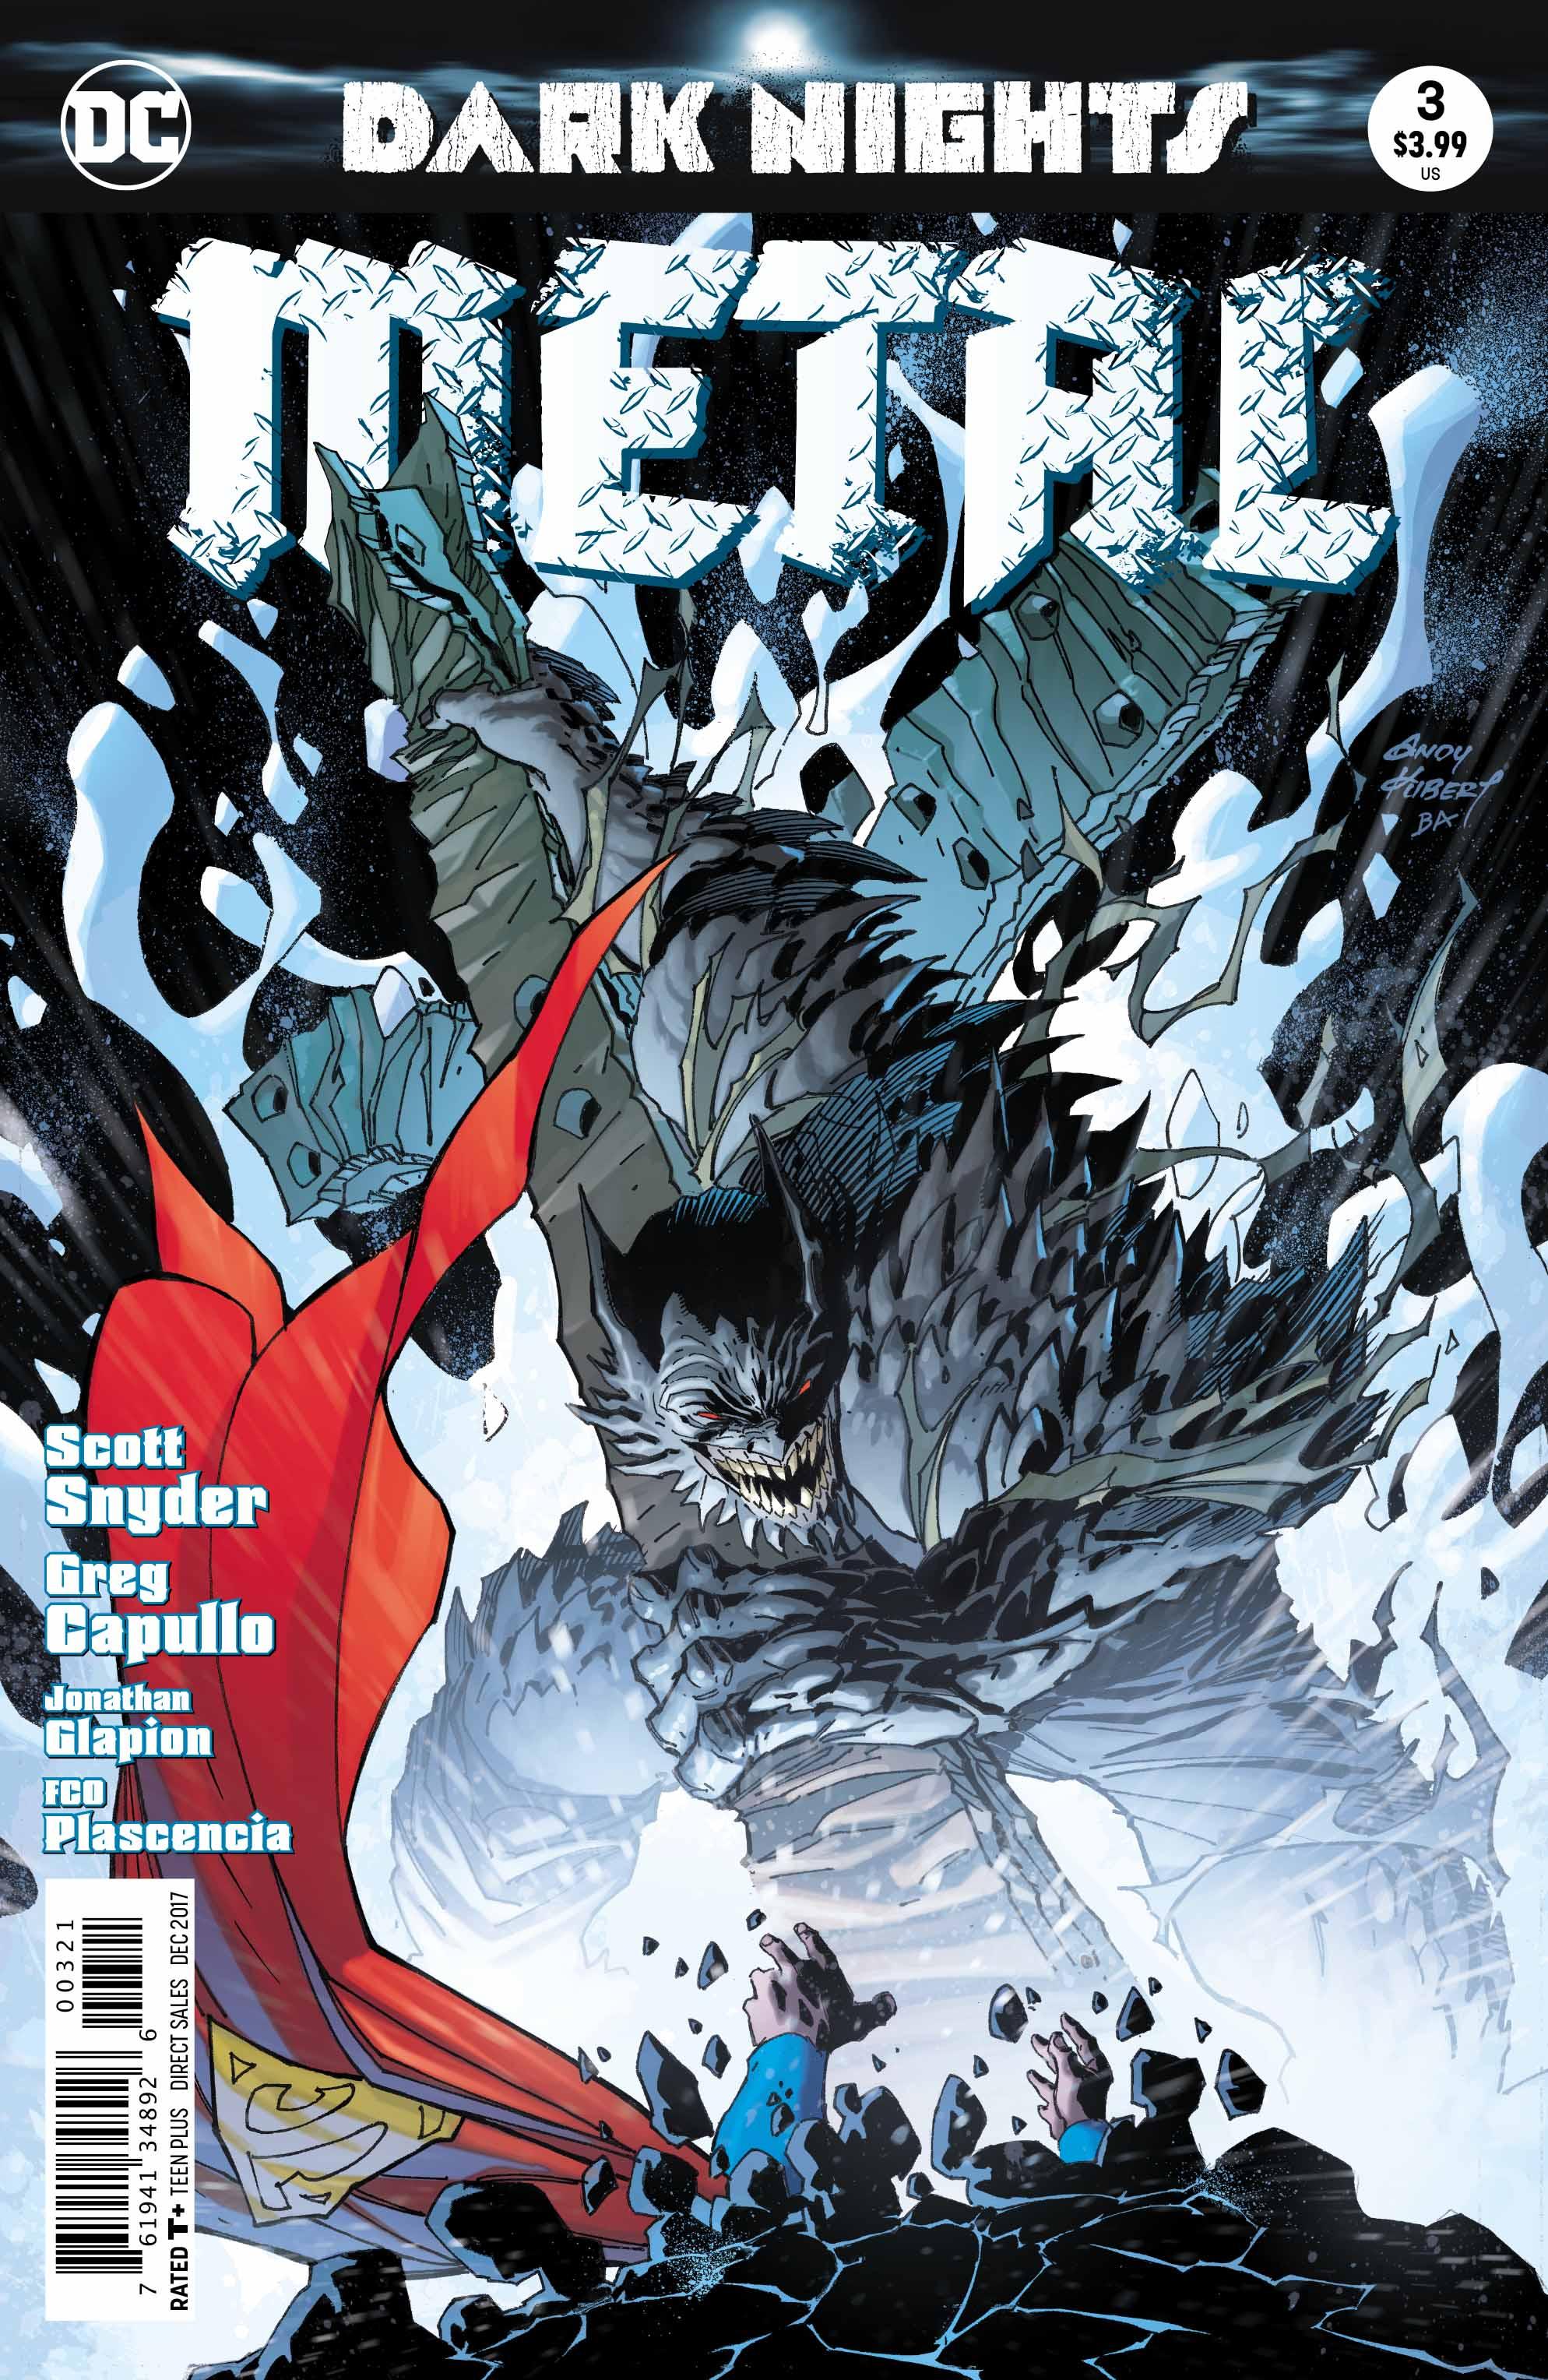 Dark Nights Metal 3- DC Comics News